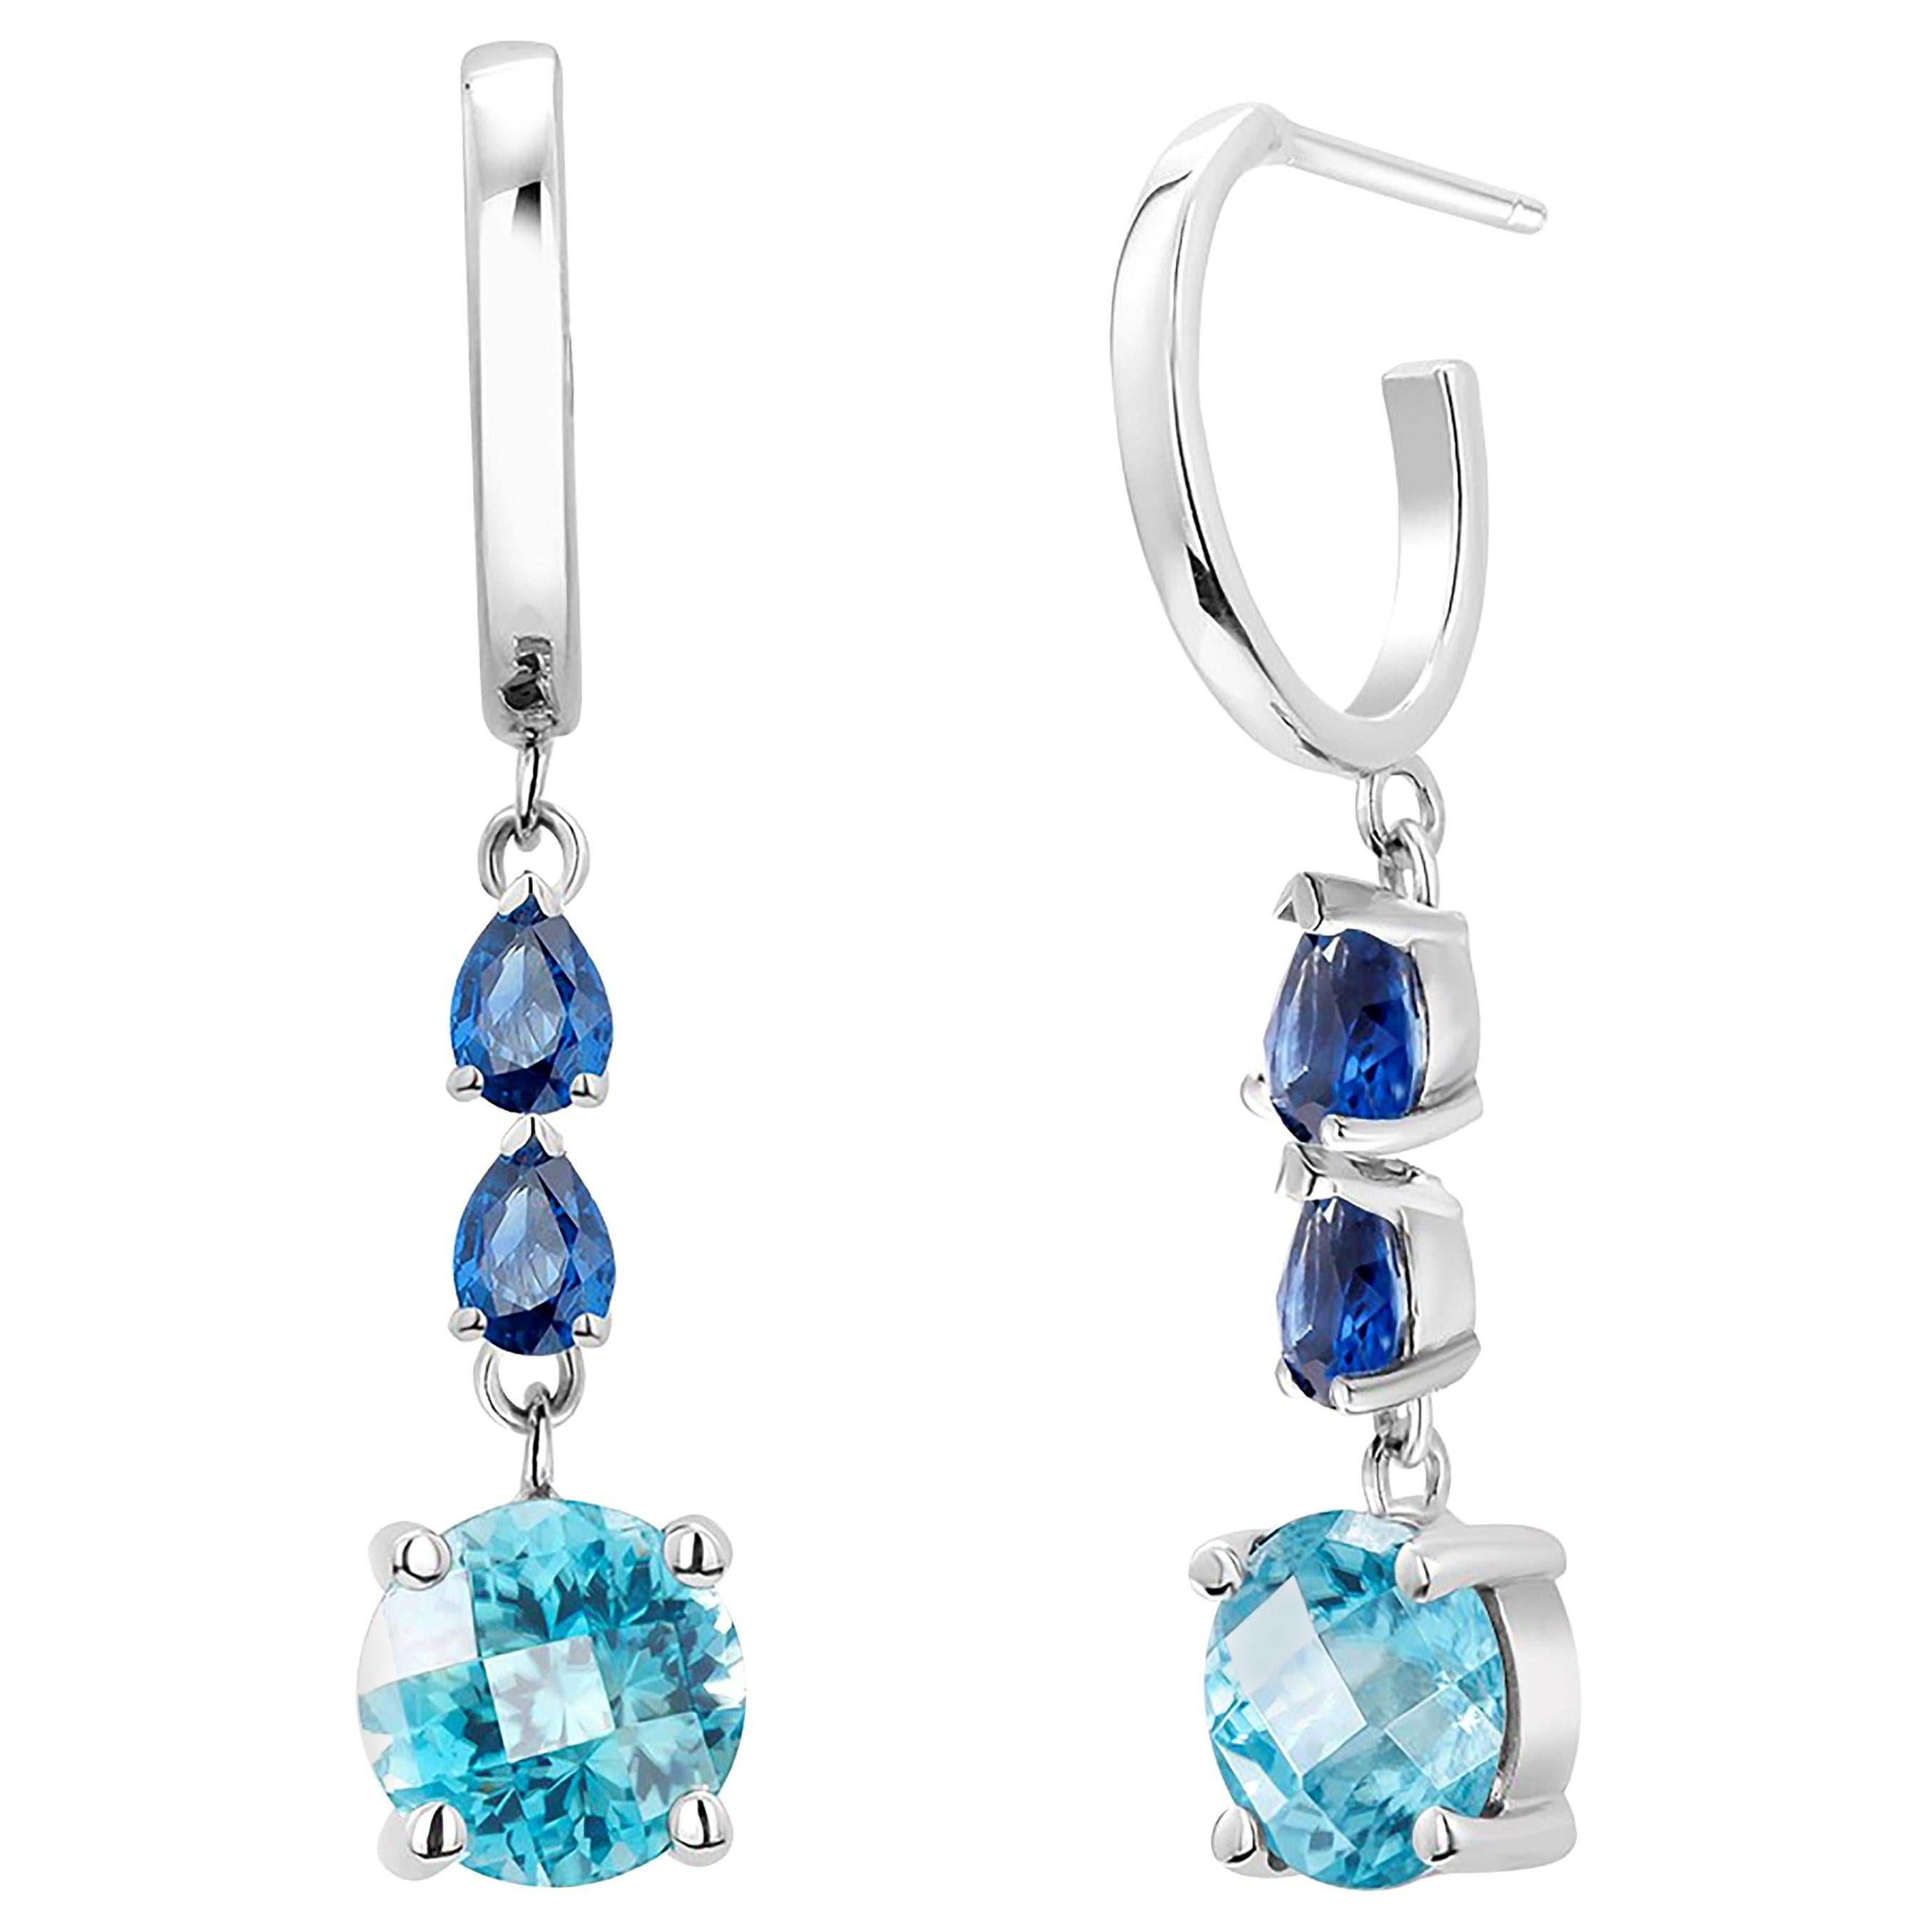 Blue Zircon and Pear Sapphire Gold Hoop Drop Earrings Weighing 5.50 Carat, Pair